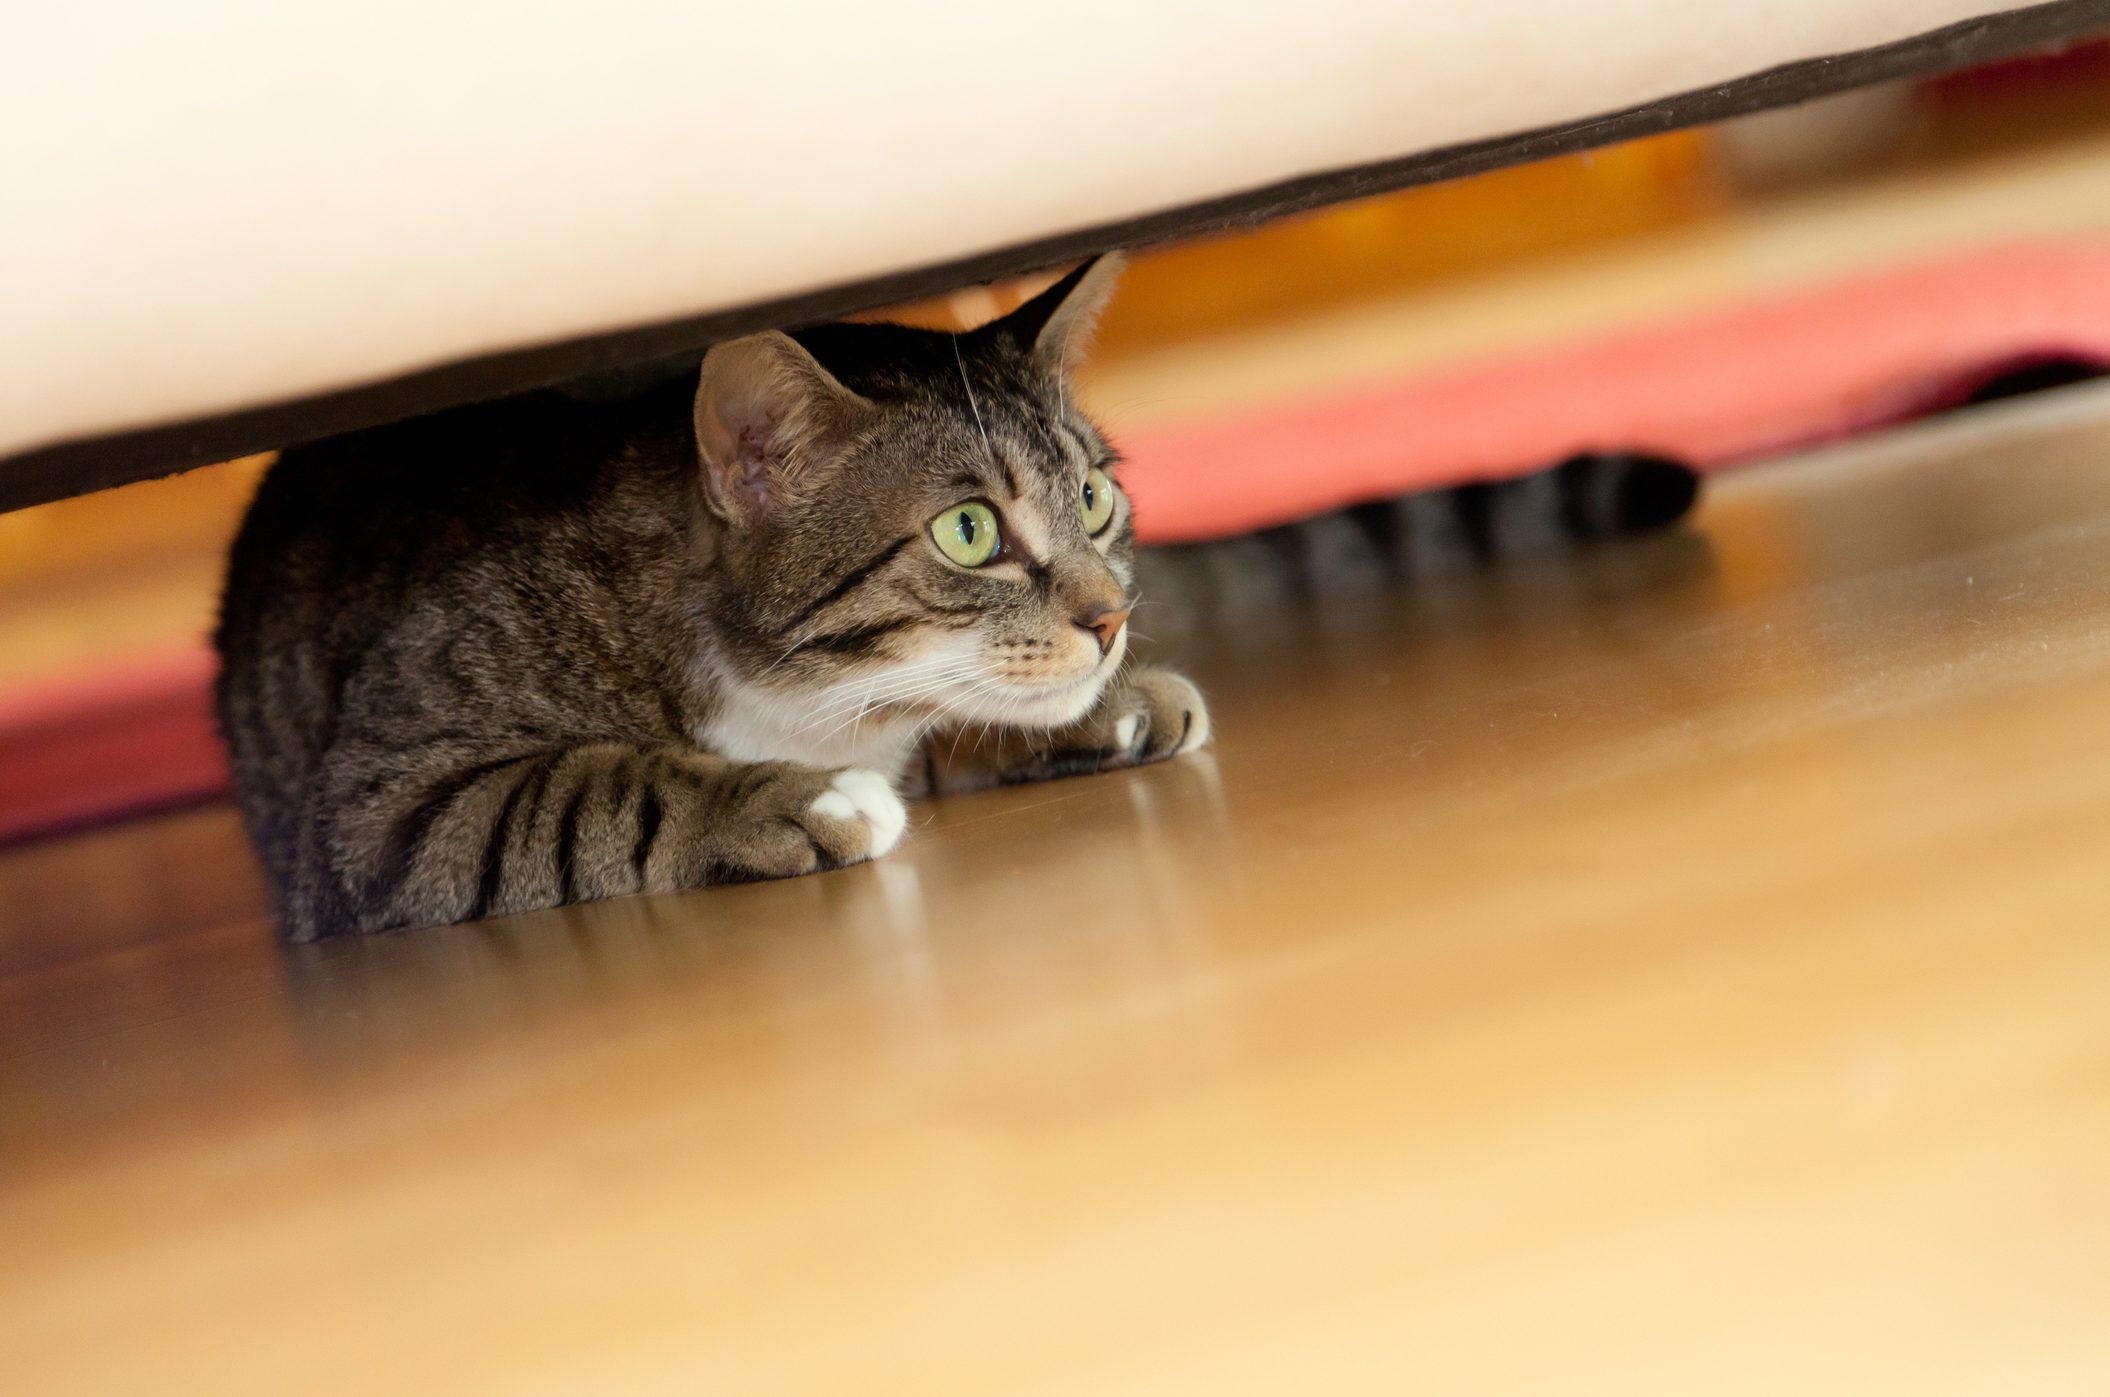 gatos-en-cuarentena-consejos-para-evitar-estres-en-tu-mascota